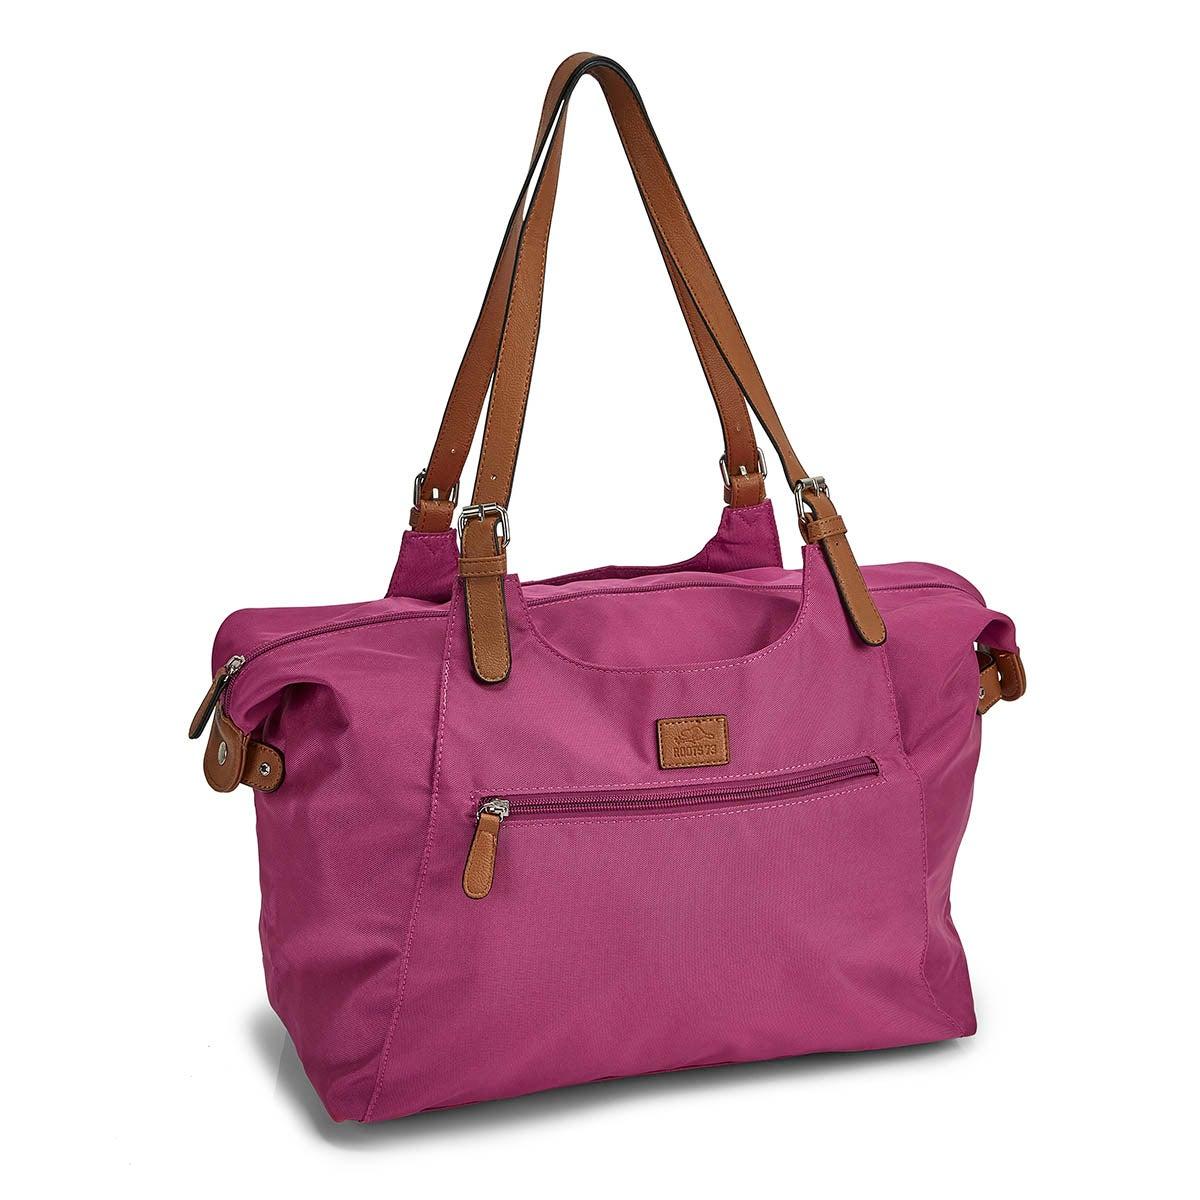 Women's R4700 fuchsia large tote bag